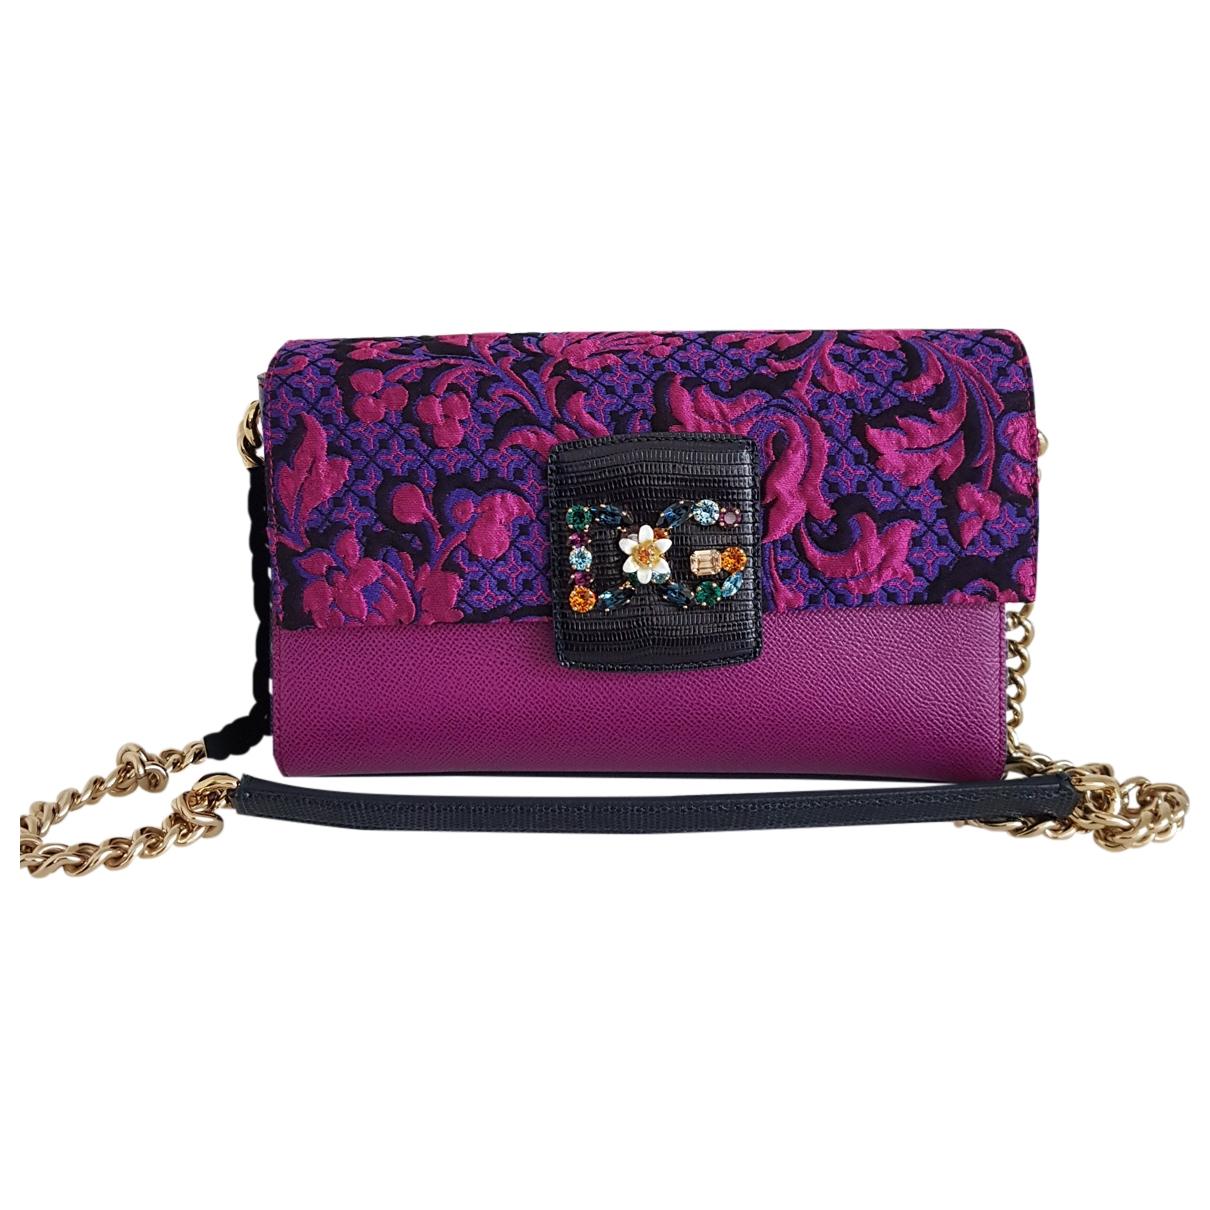 Dolce & Gabbana Millenials Multicolour Leather handbag for Women \N